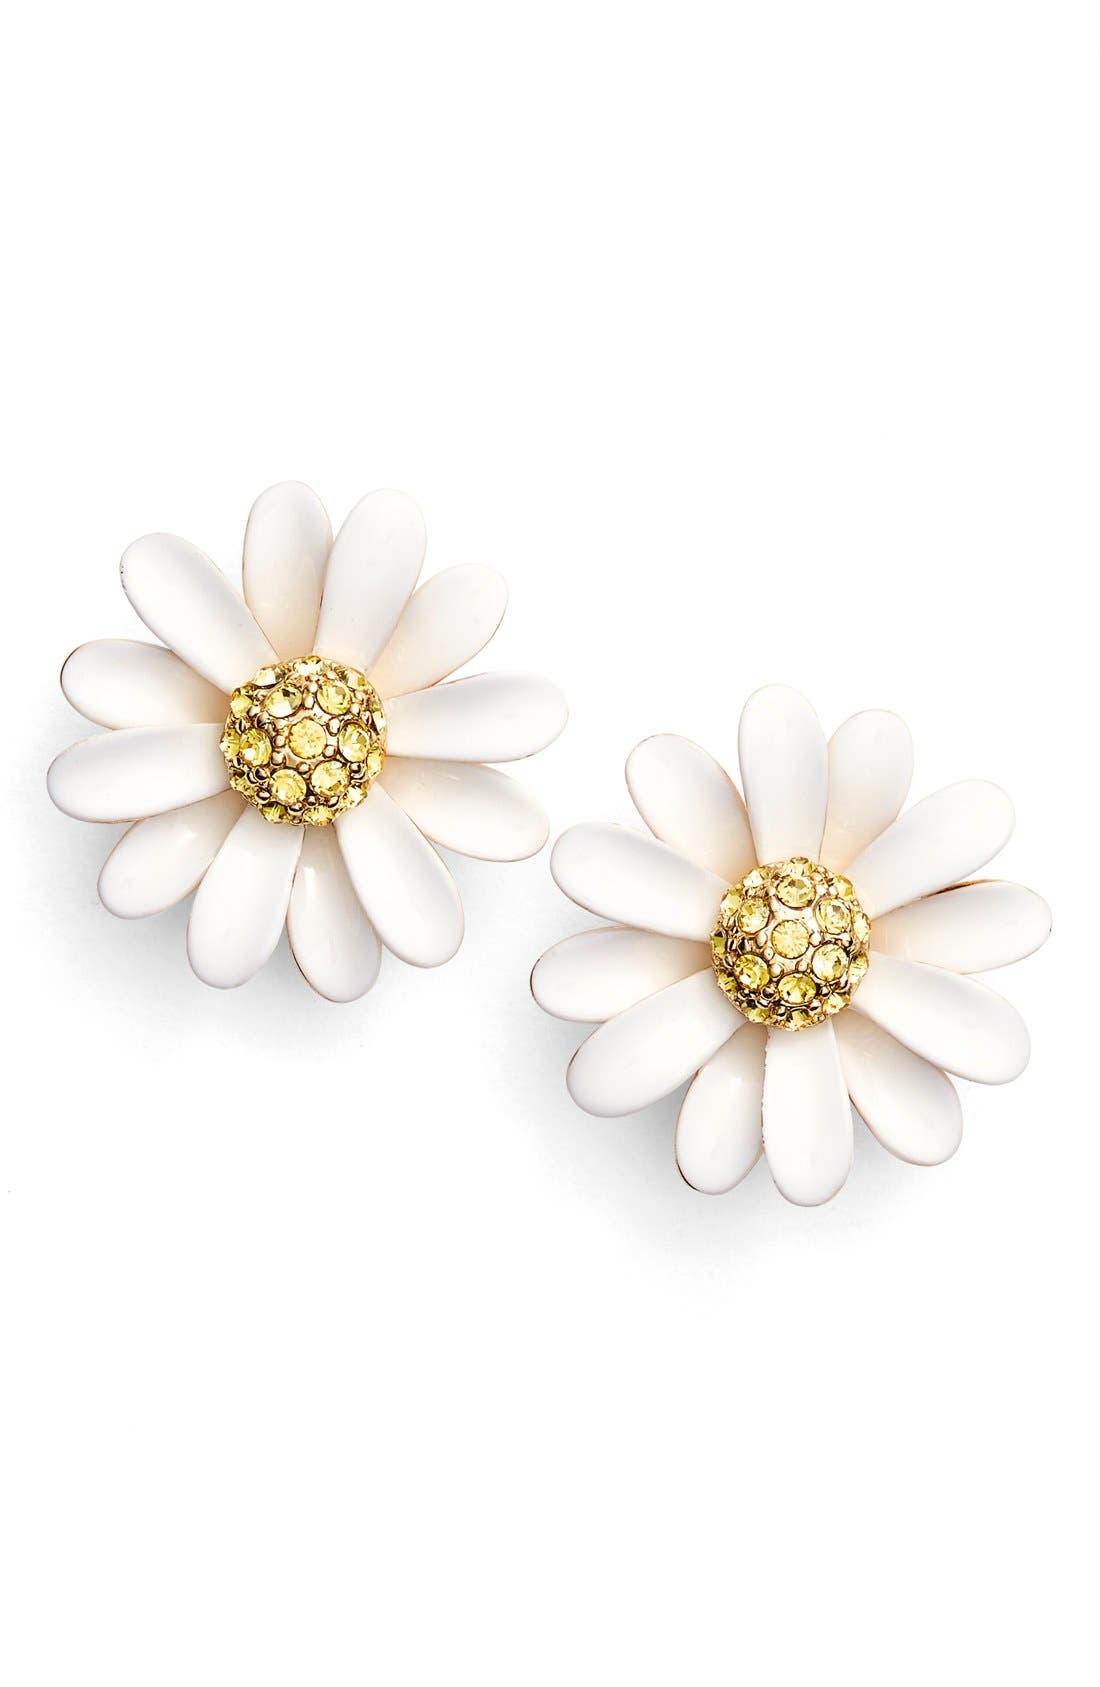 Main Image - kate spade new york 'dazzling daisies' stud earrings